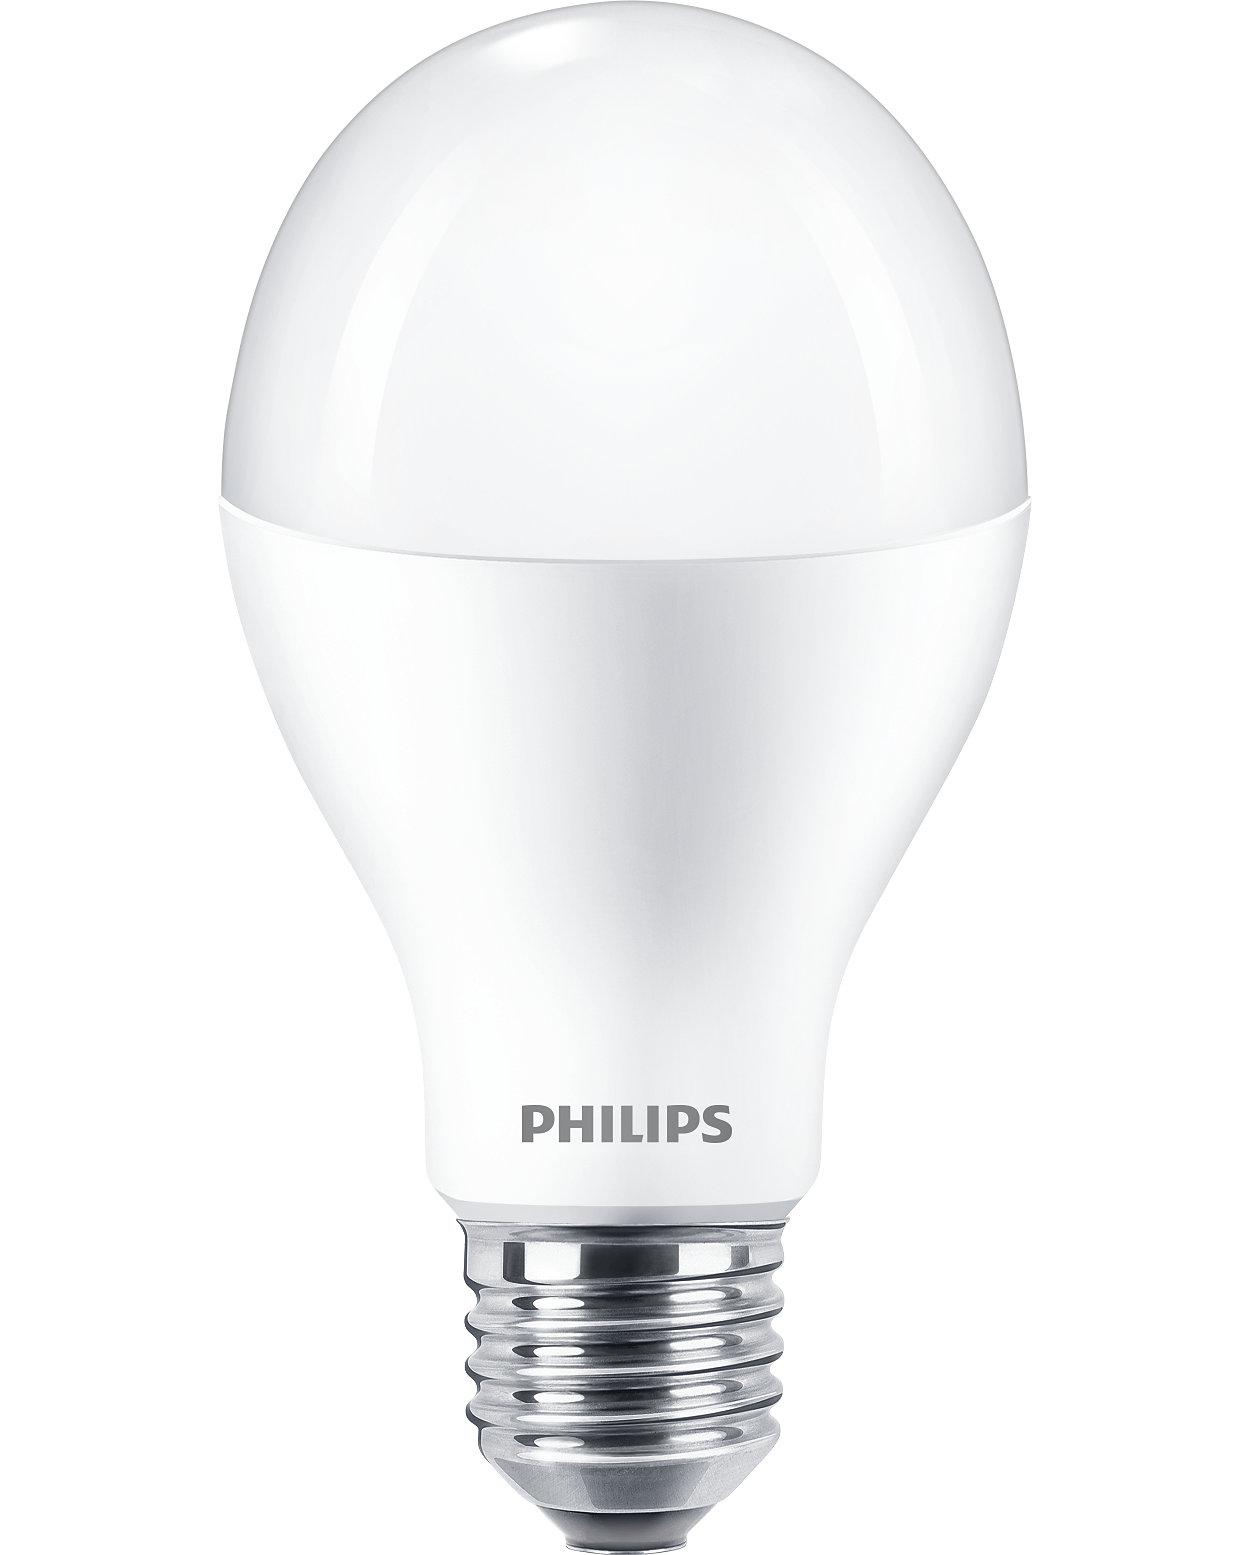 CorePro LED-pærer til en overkommelig pris